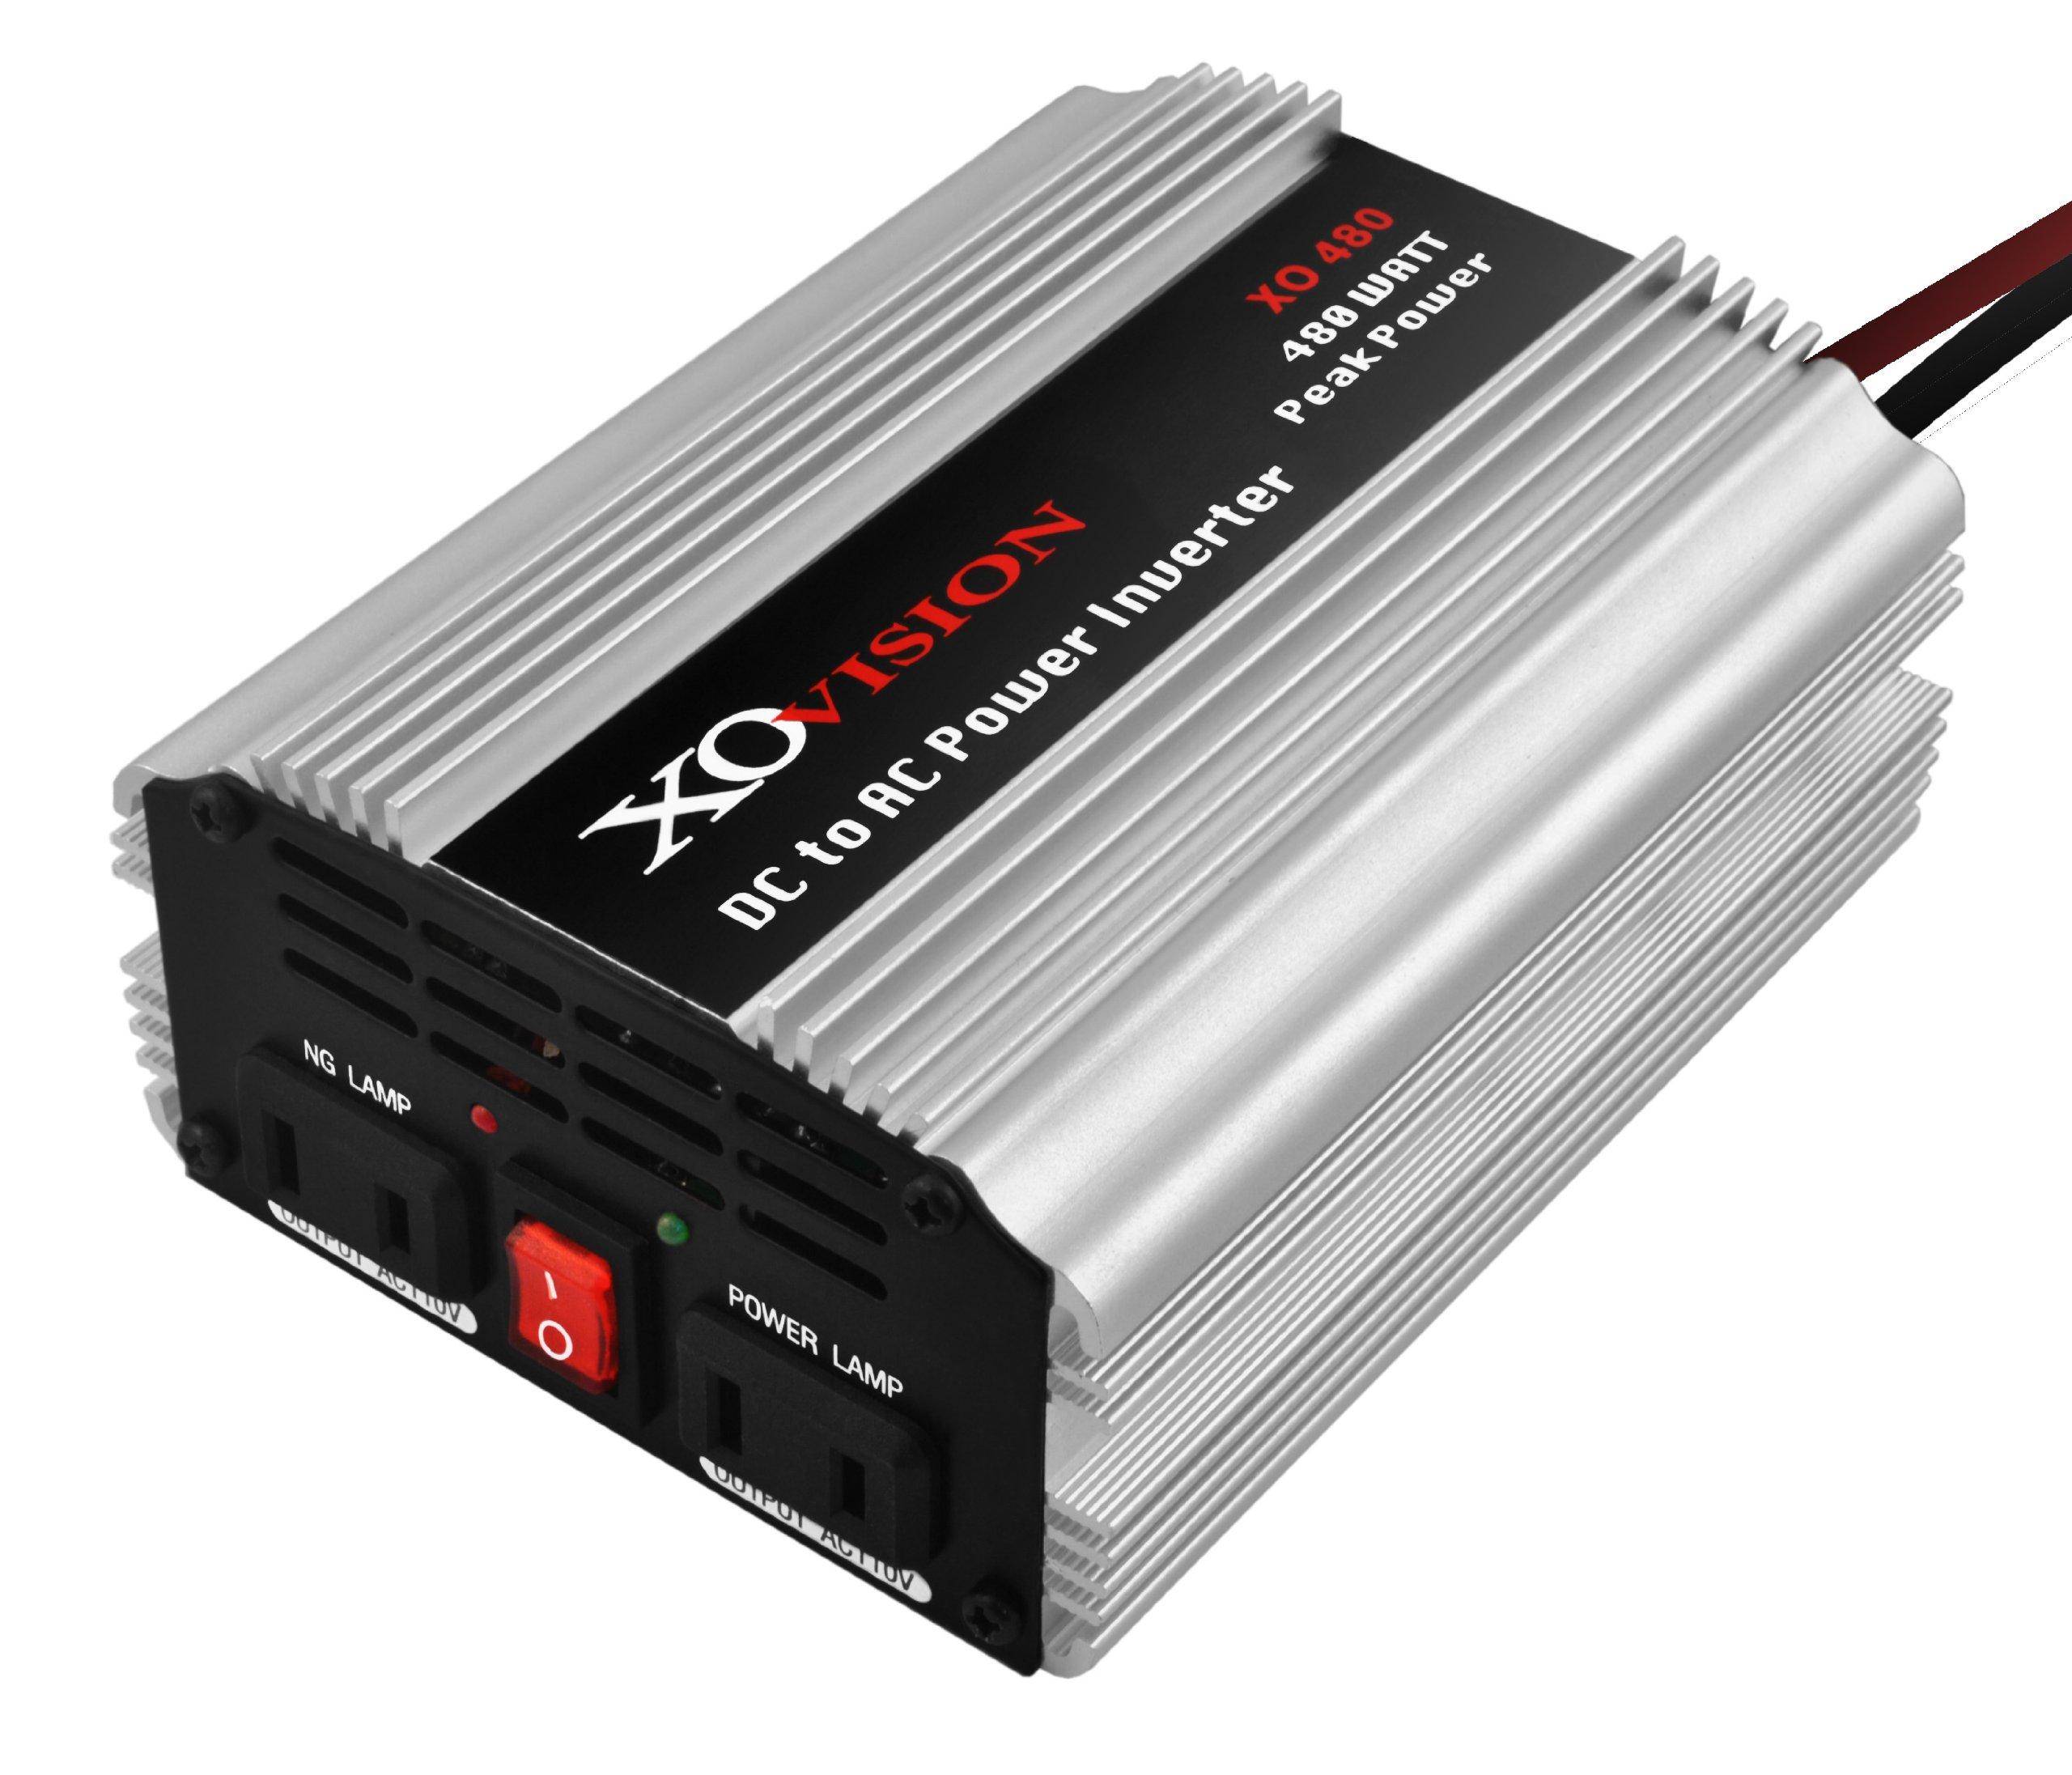 XO Vision 480-Watt DC to AC Power Inverter, (Silver)